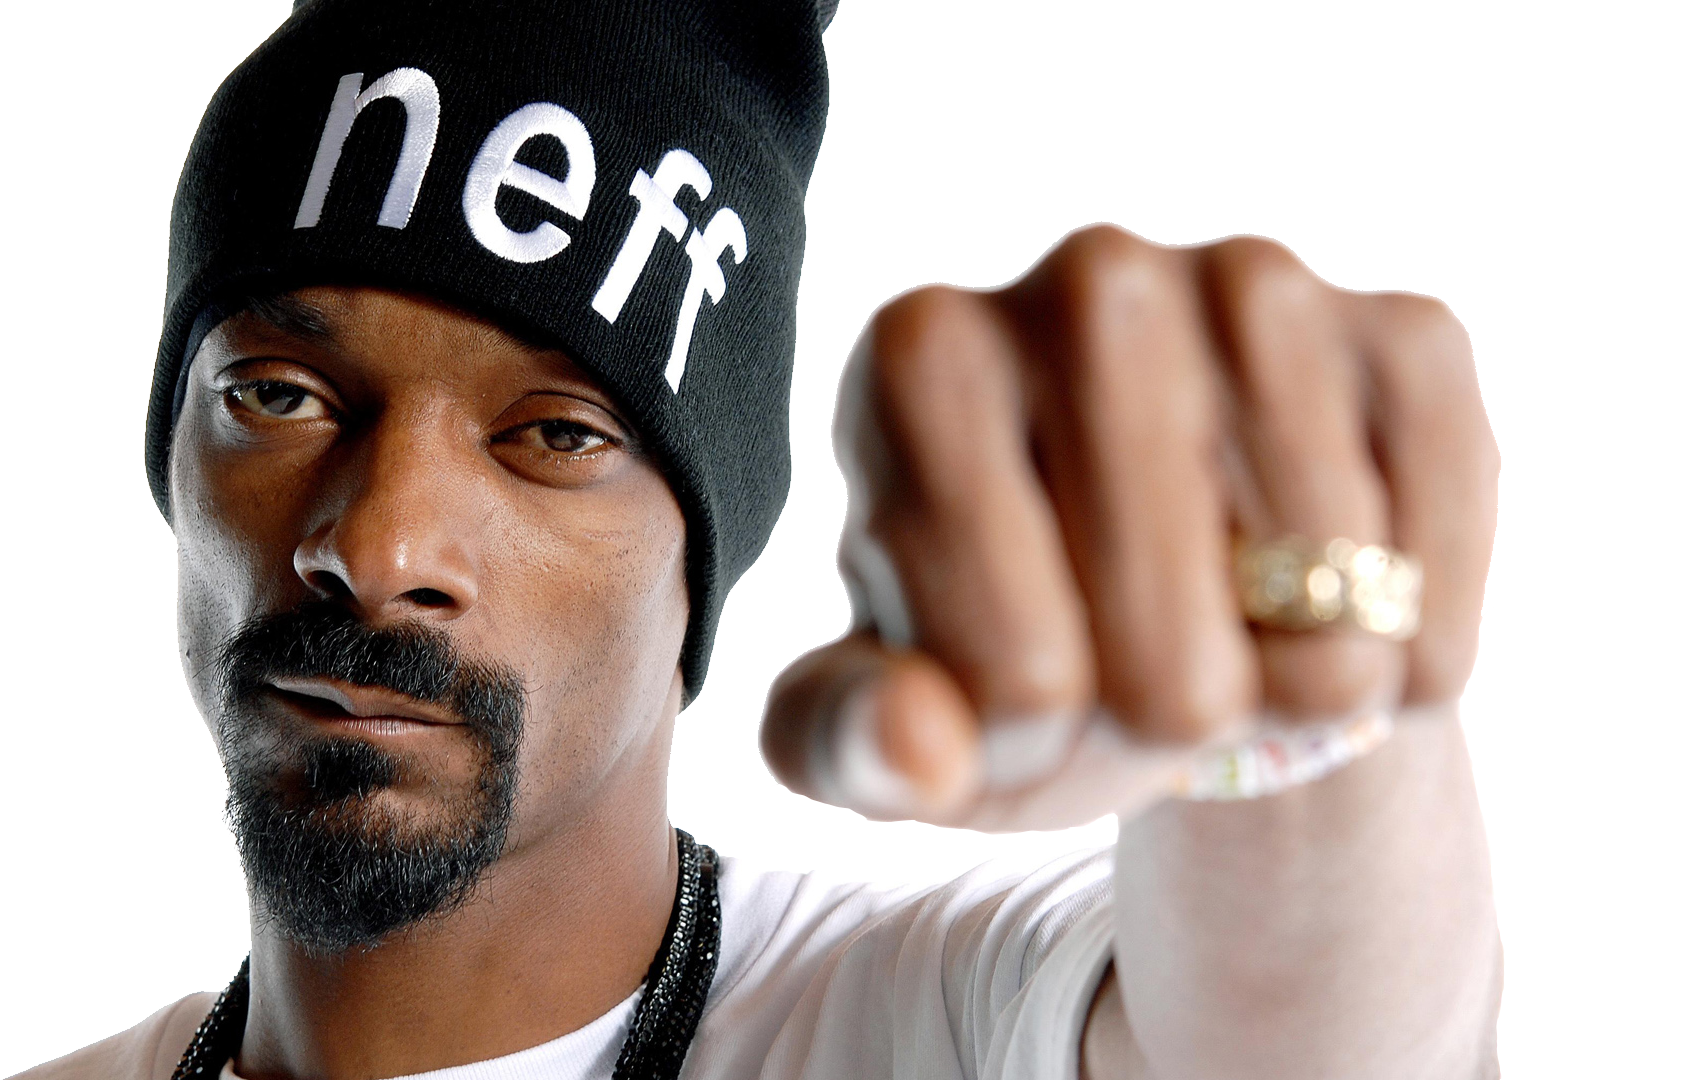 Snoop Dogg Png Image Snoop Dogg Dogg Rap